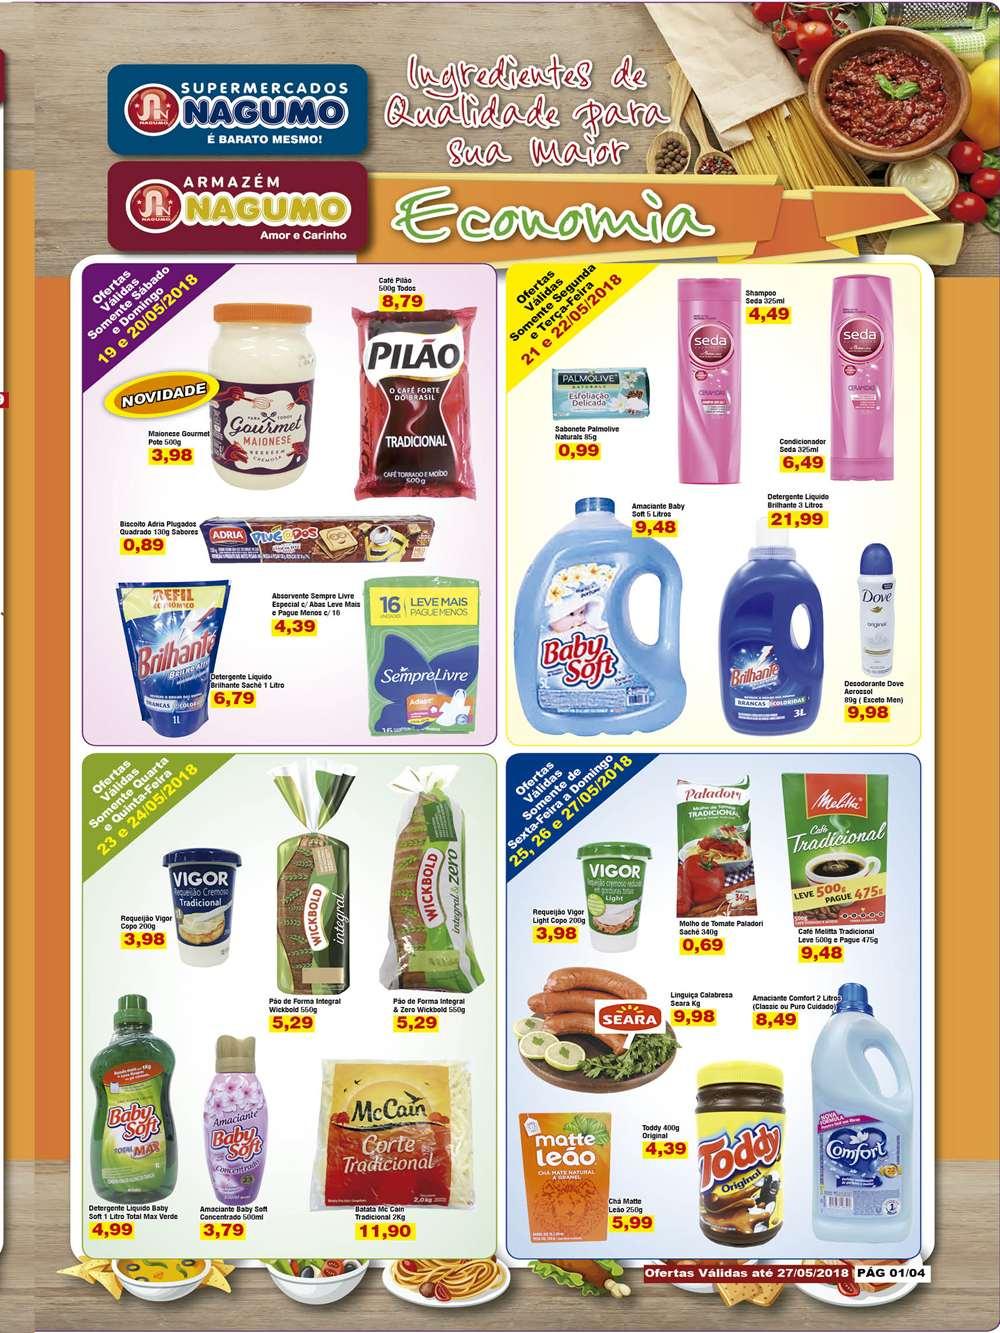 Ofertas-nagumo1-1 Ofertas de Supermercados